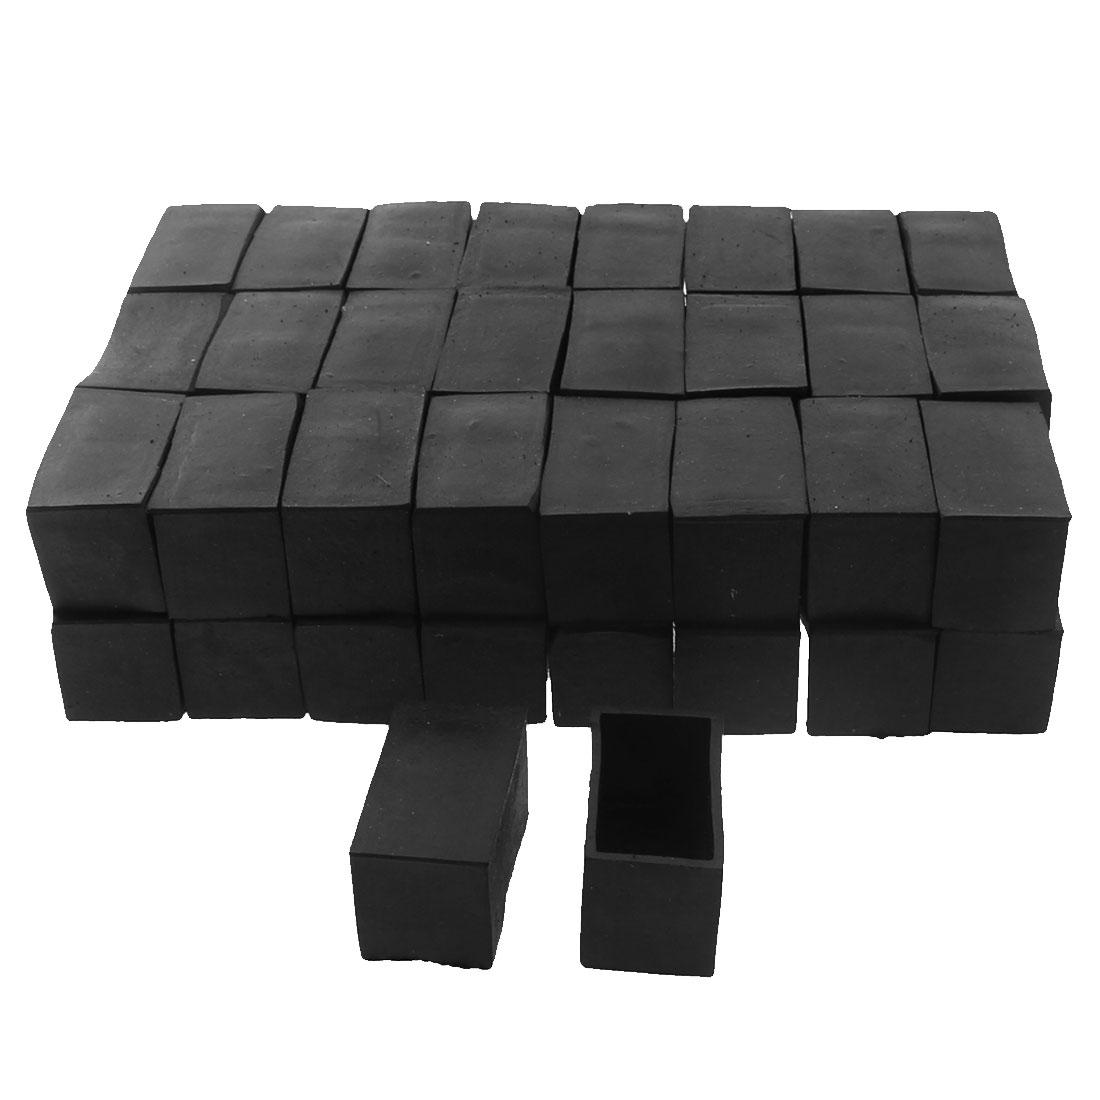 40mm x 20mm Rectangle Shape Furniture Table Chair Foot Leg Rubber End Cap Cover Black 50pcs